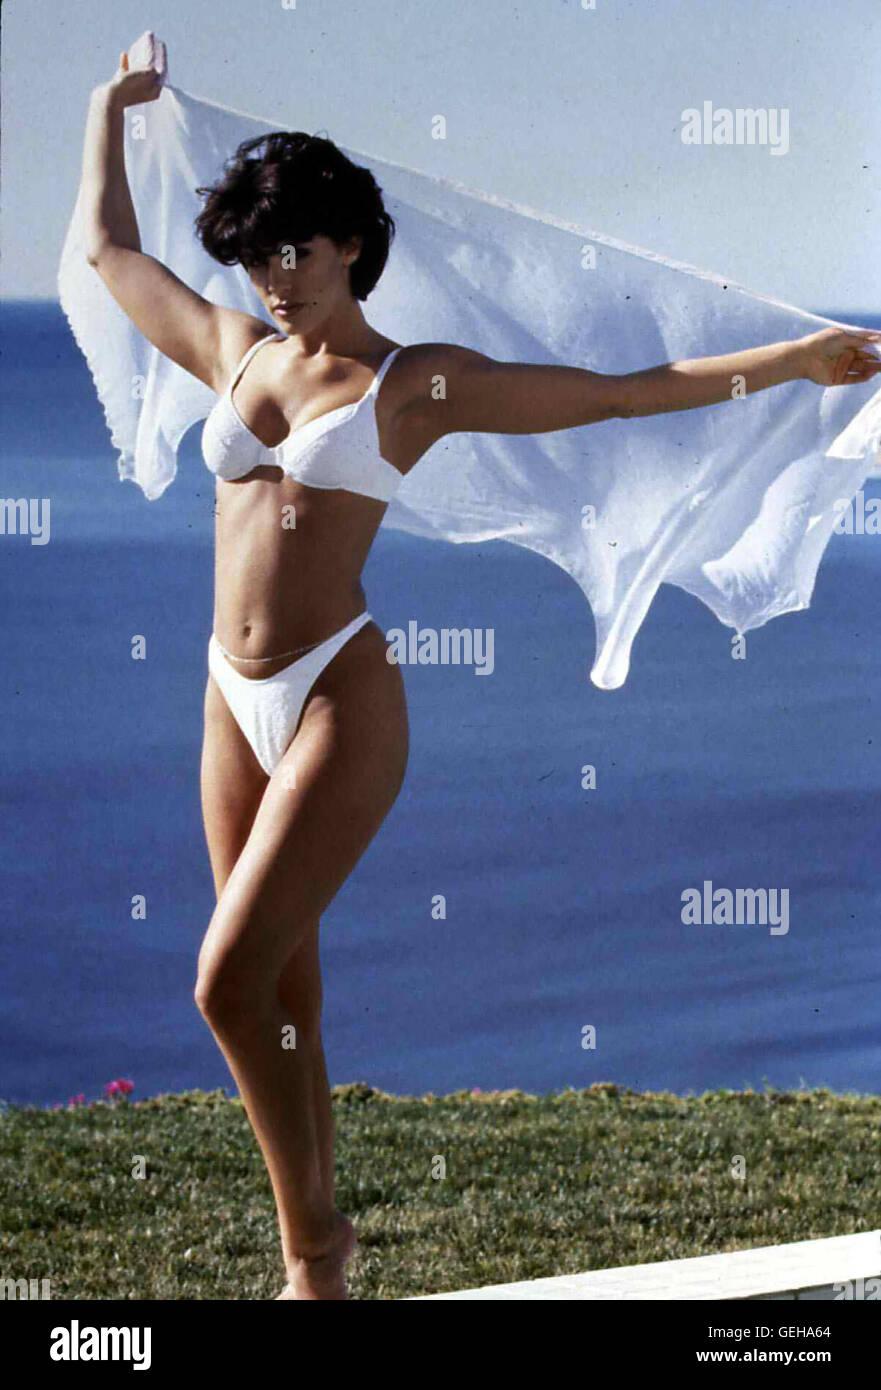 Stef Prescott (b. 1991) Erotic pics & movies Kathleen Crowley,Rosalind Marquis